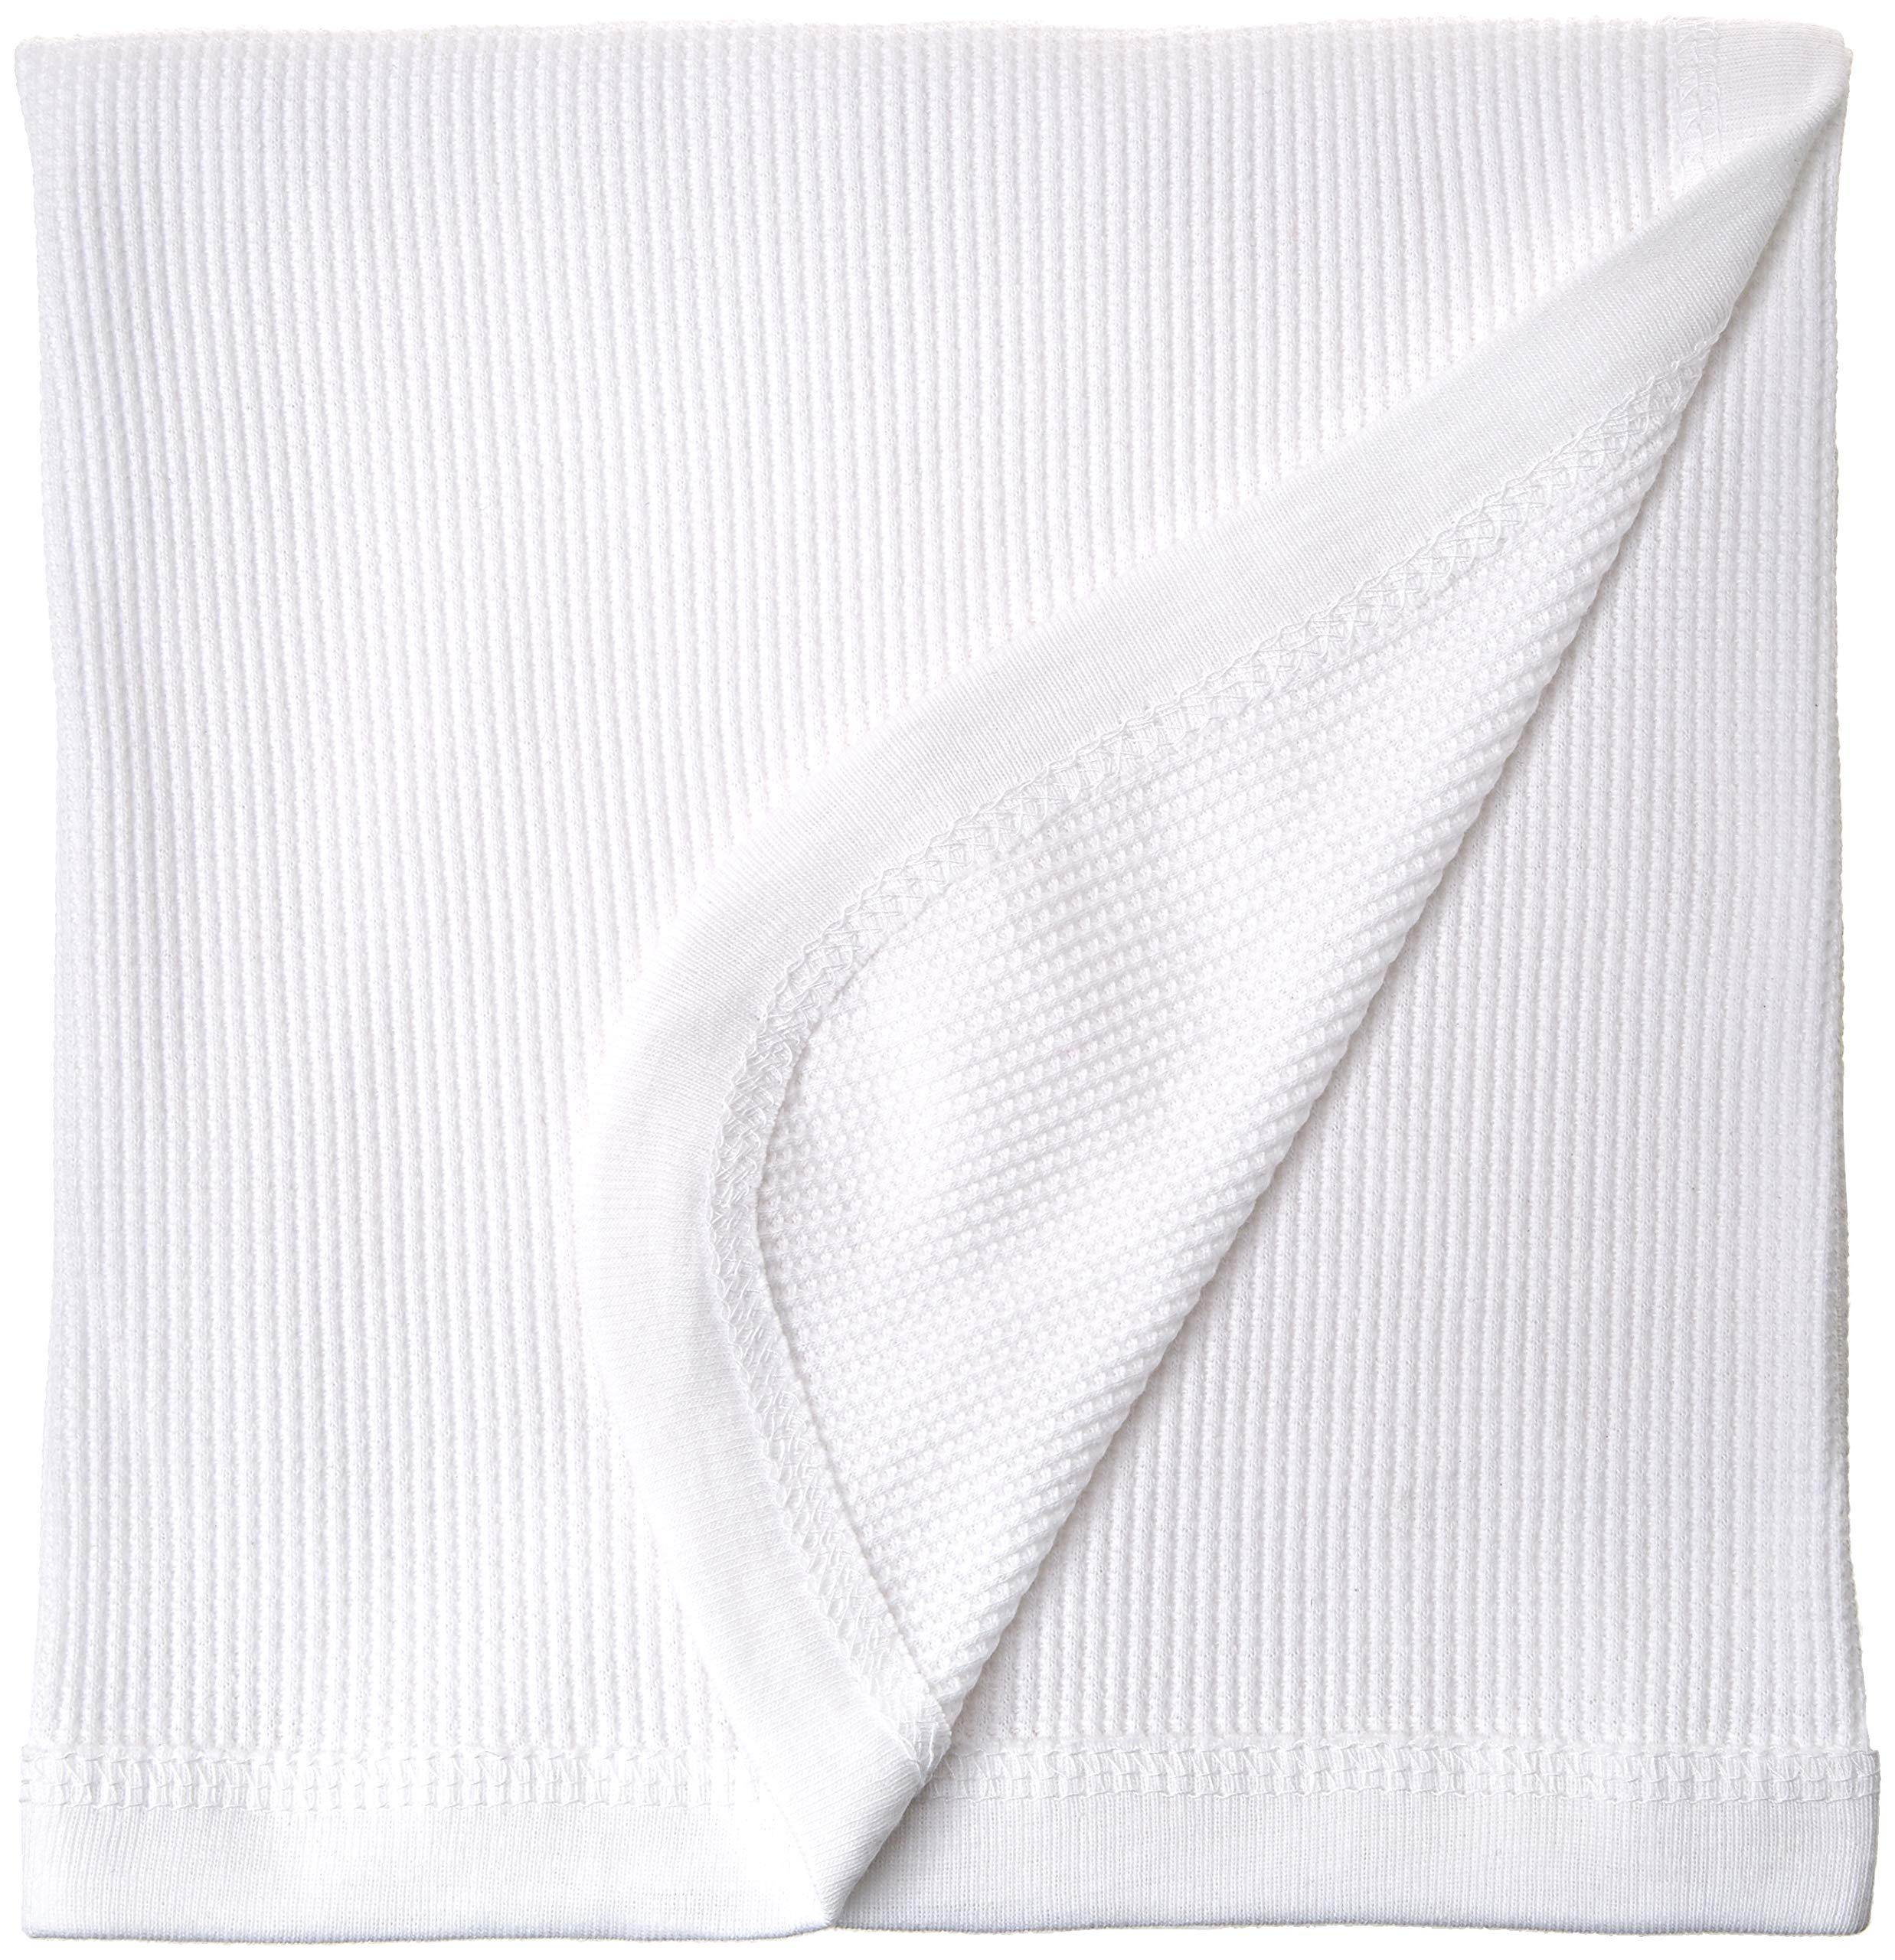 1b4619025e Bambino Basics 100% COTTON - Waffle Knit Thermal Receiving Blankets - 30